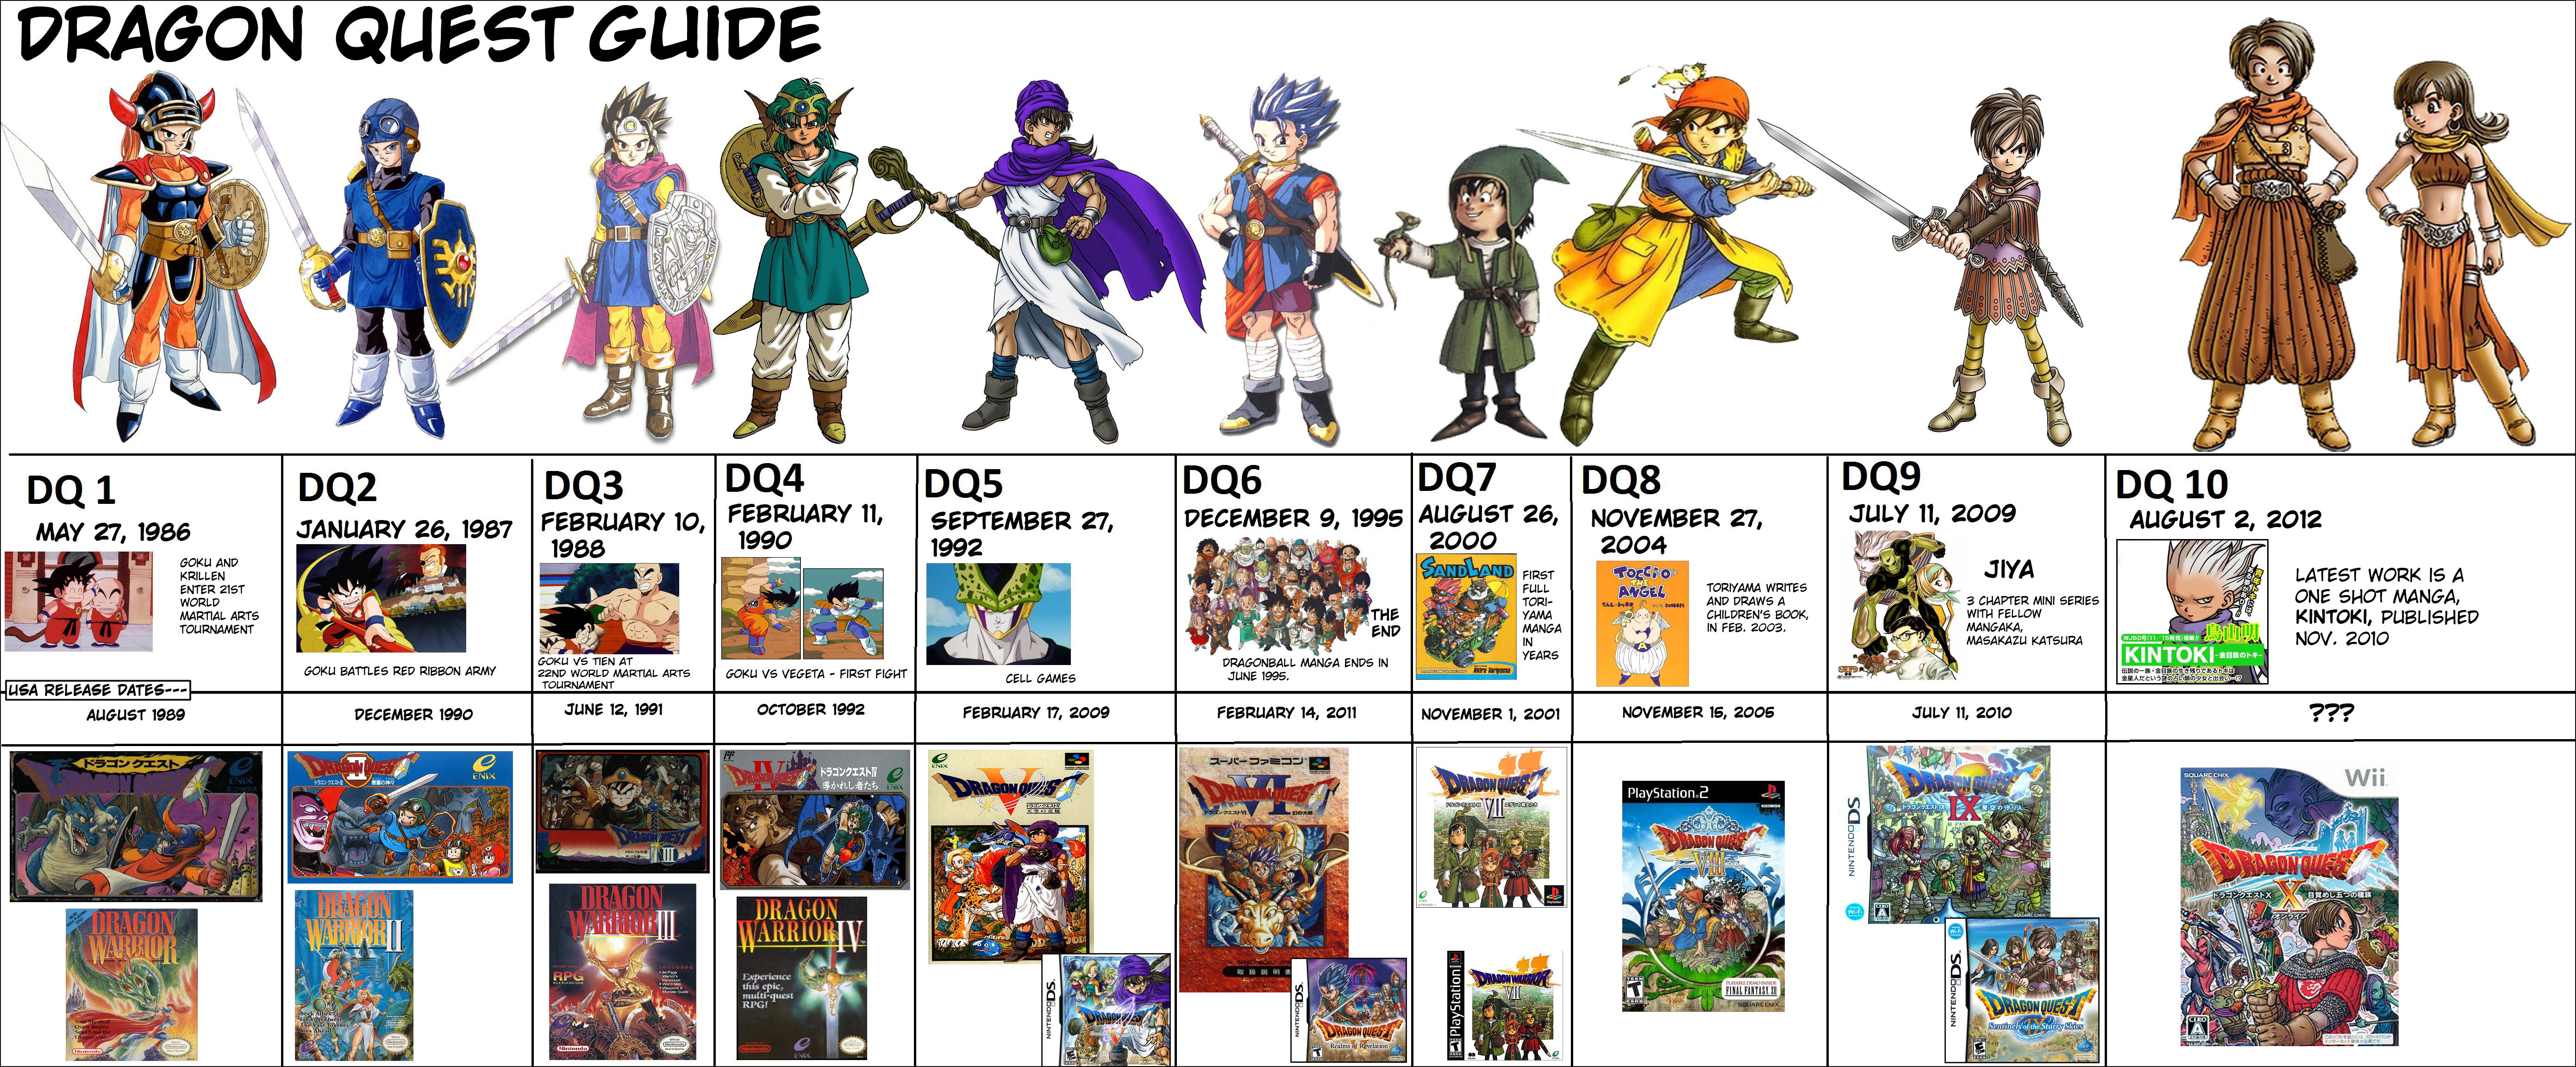 48+] Dragon Quest Heroes Wallpaper on WallpaperSafari